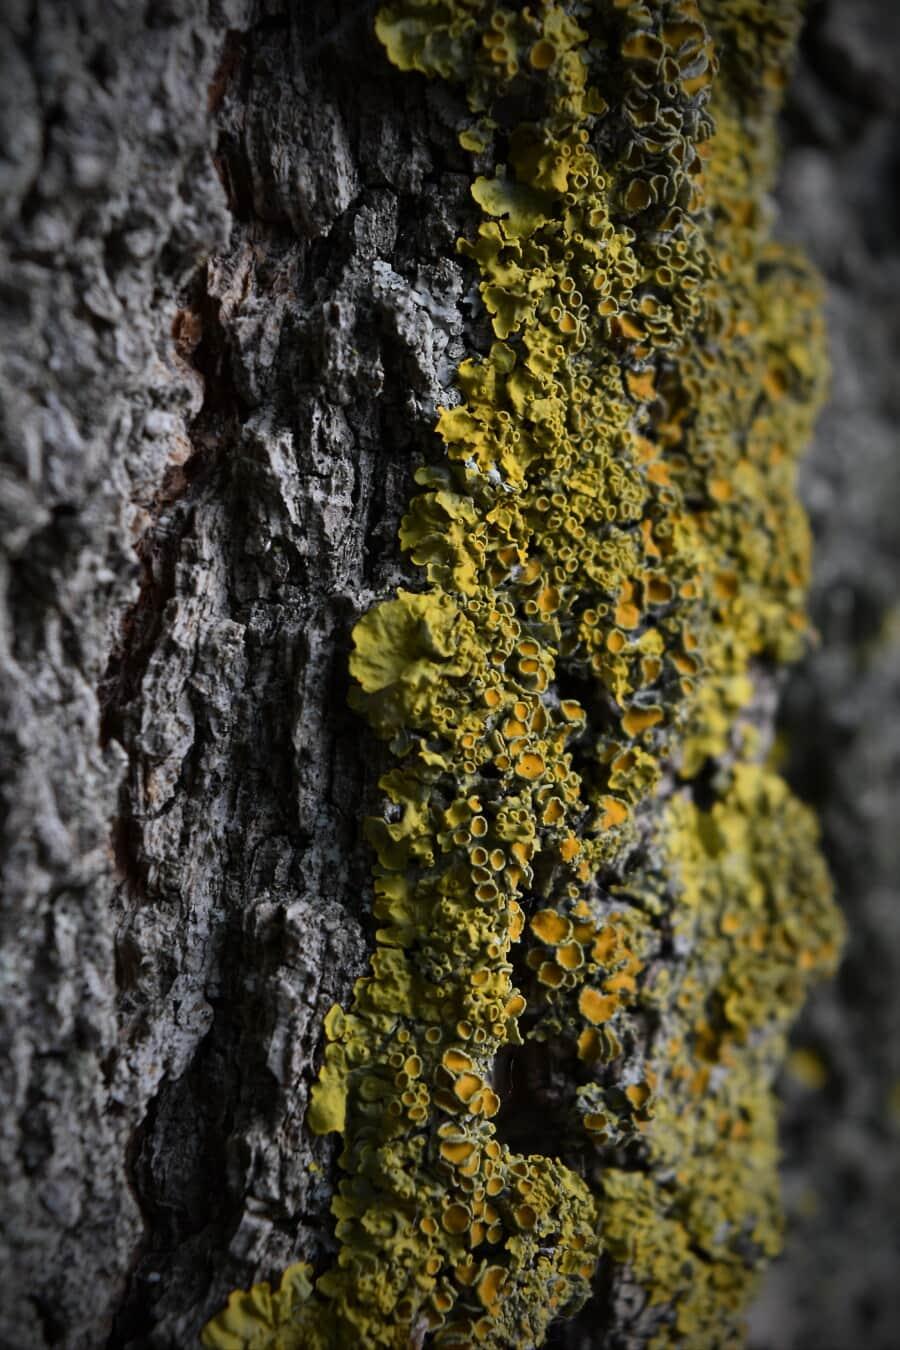 moosig, Flechten, Borke, Holz, Textur, Pilz, Pappel, Struktur, Moos, Natur